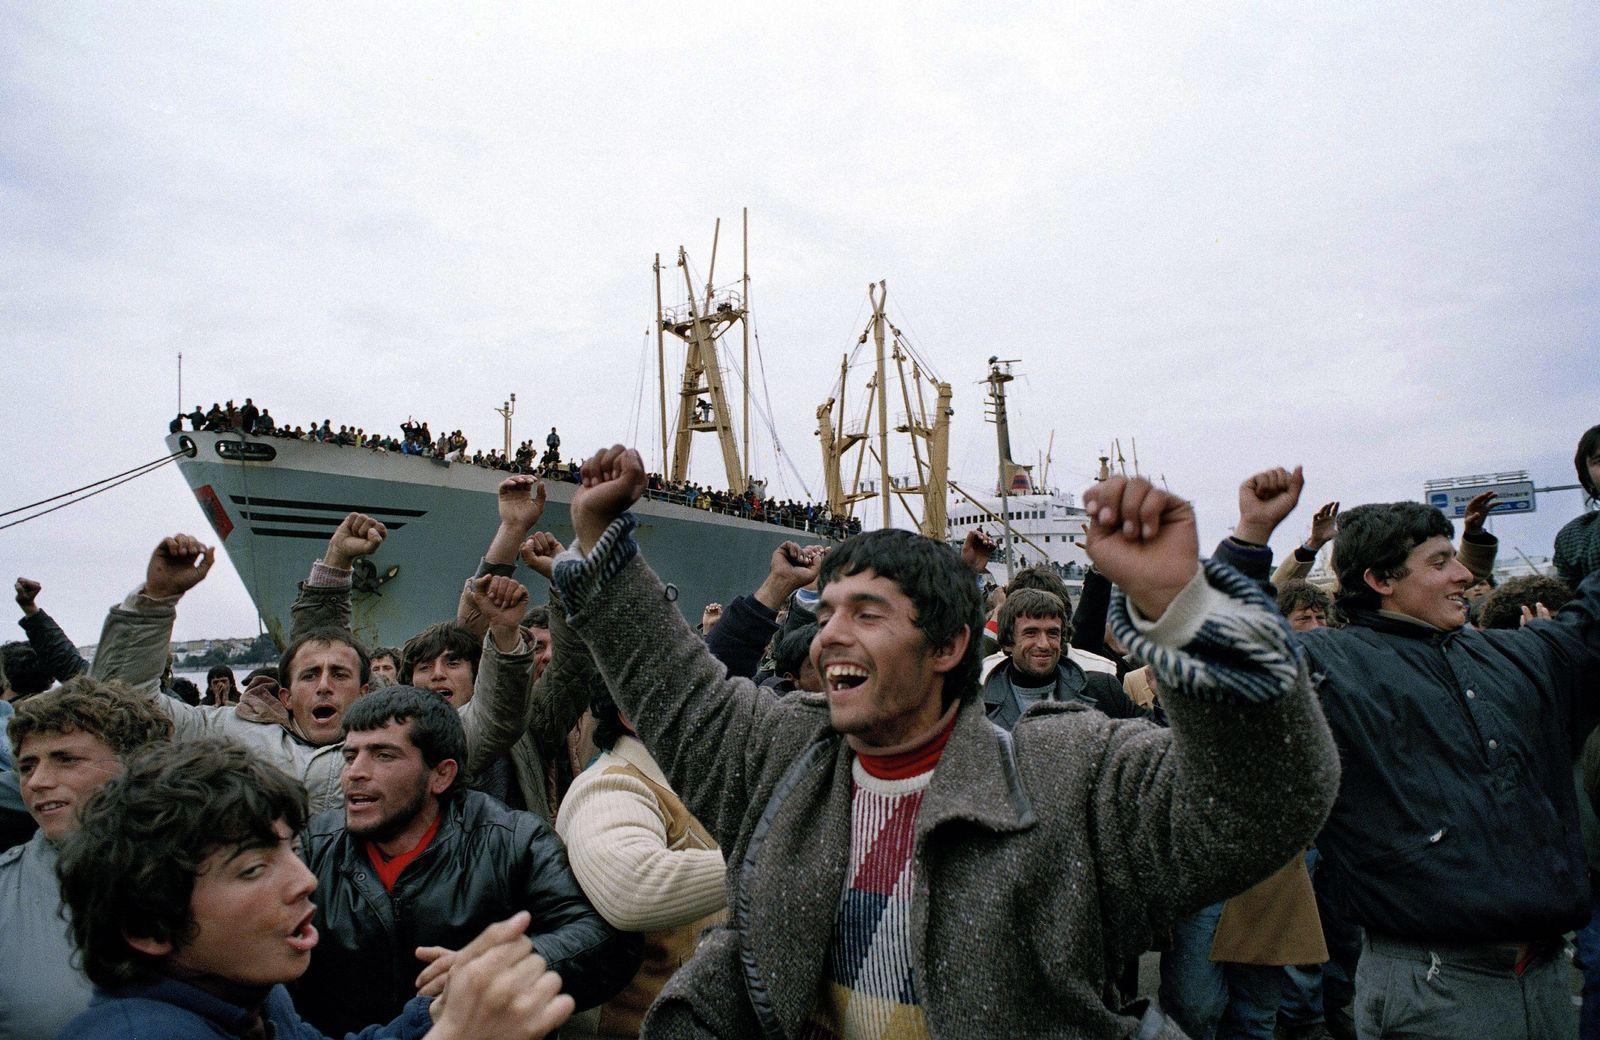 Tirana/ Flüchtlinge/ zurückgekehrt